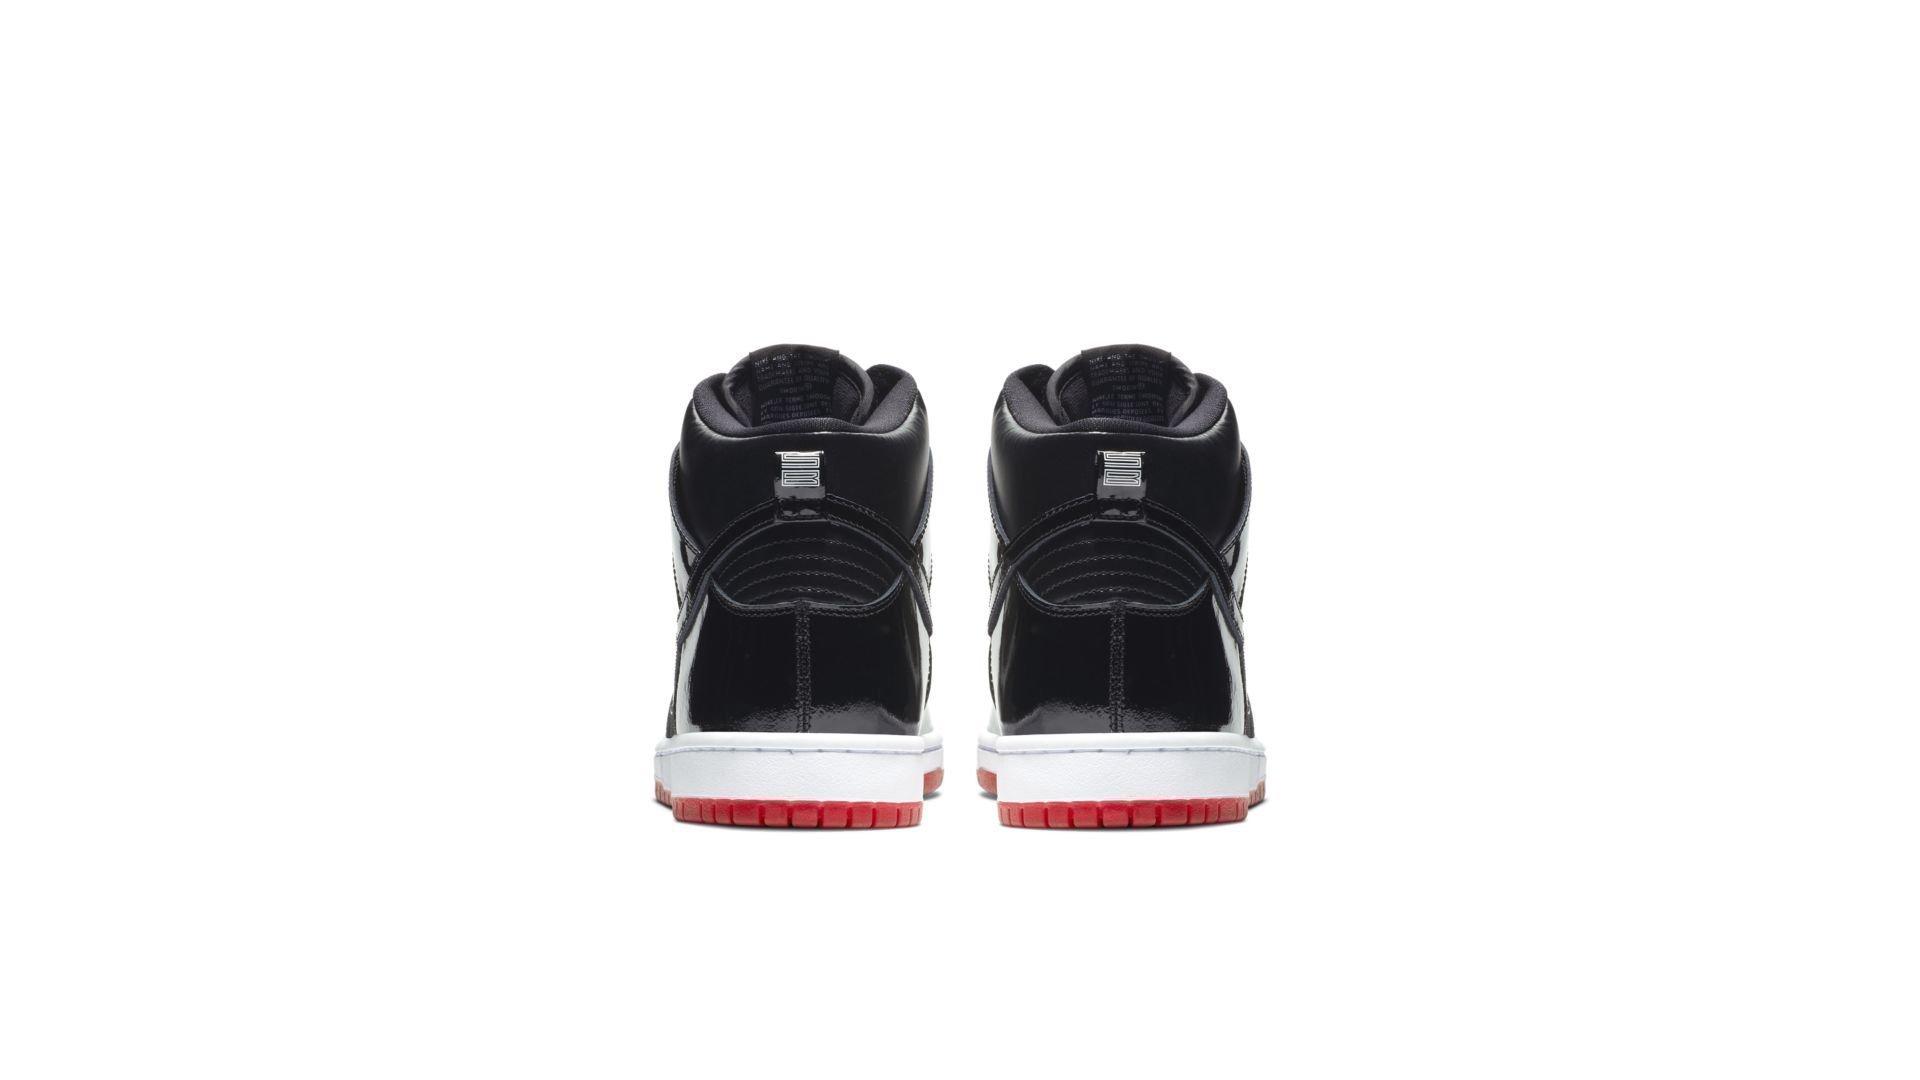 Nike SB Dunk AJ7730-001